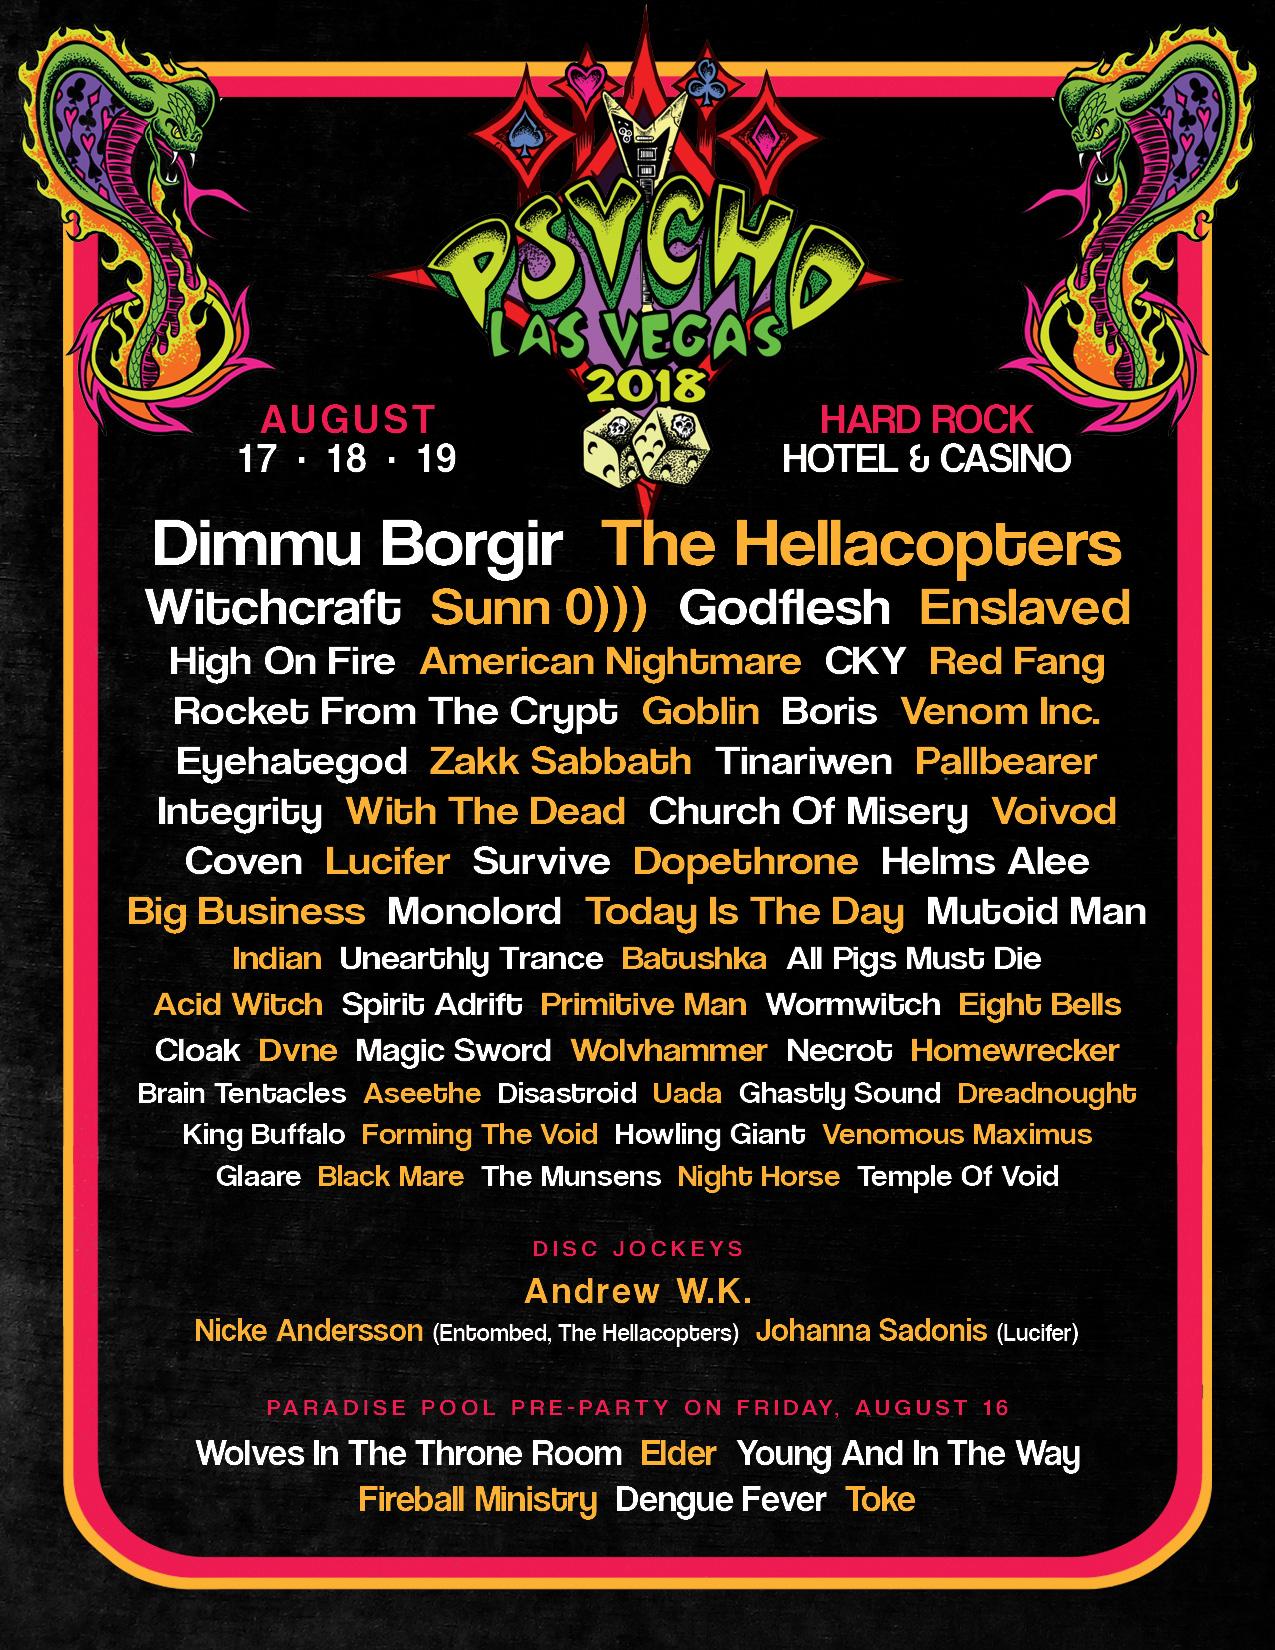 Psycho Las Vegas 2018 poster